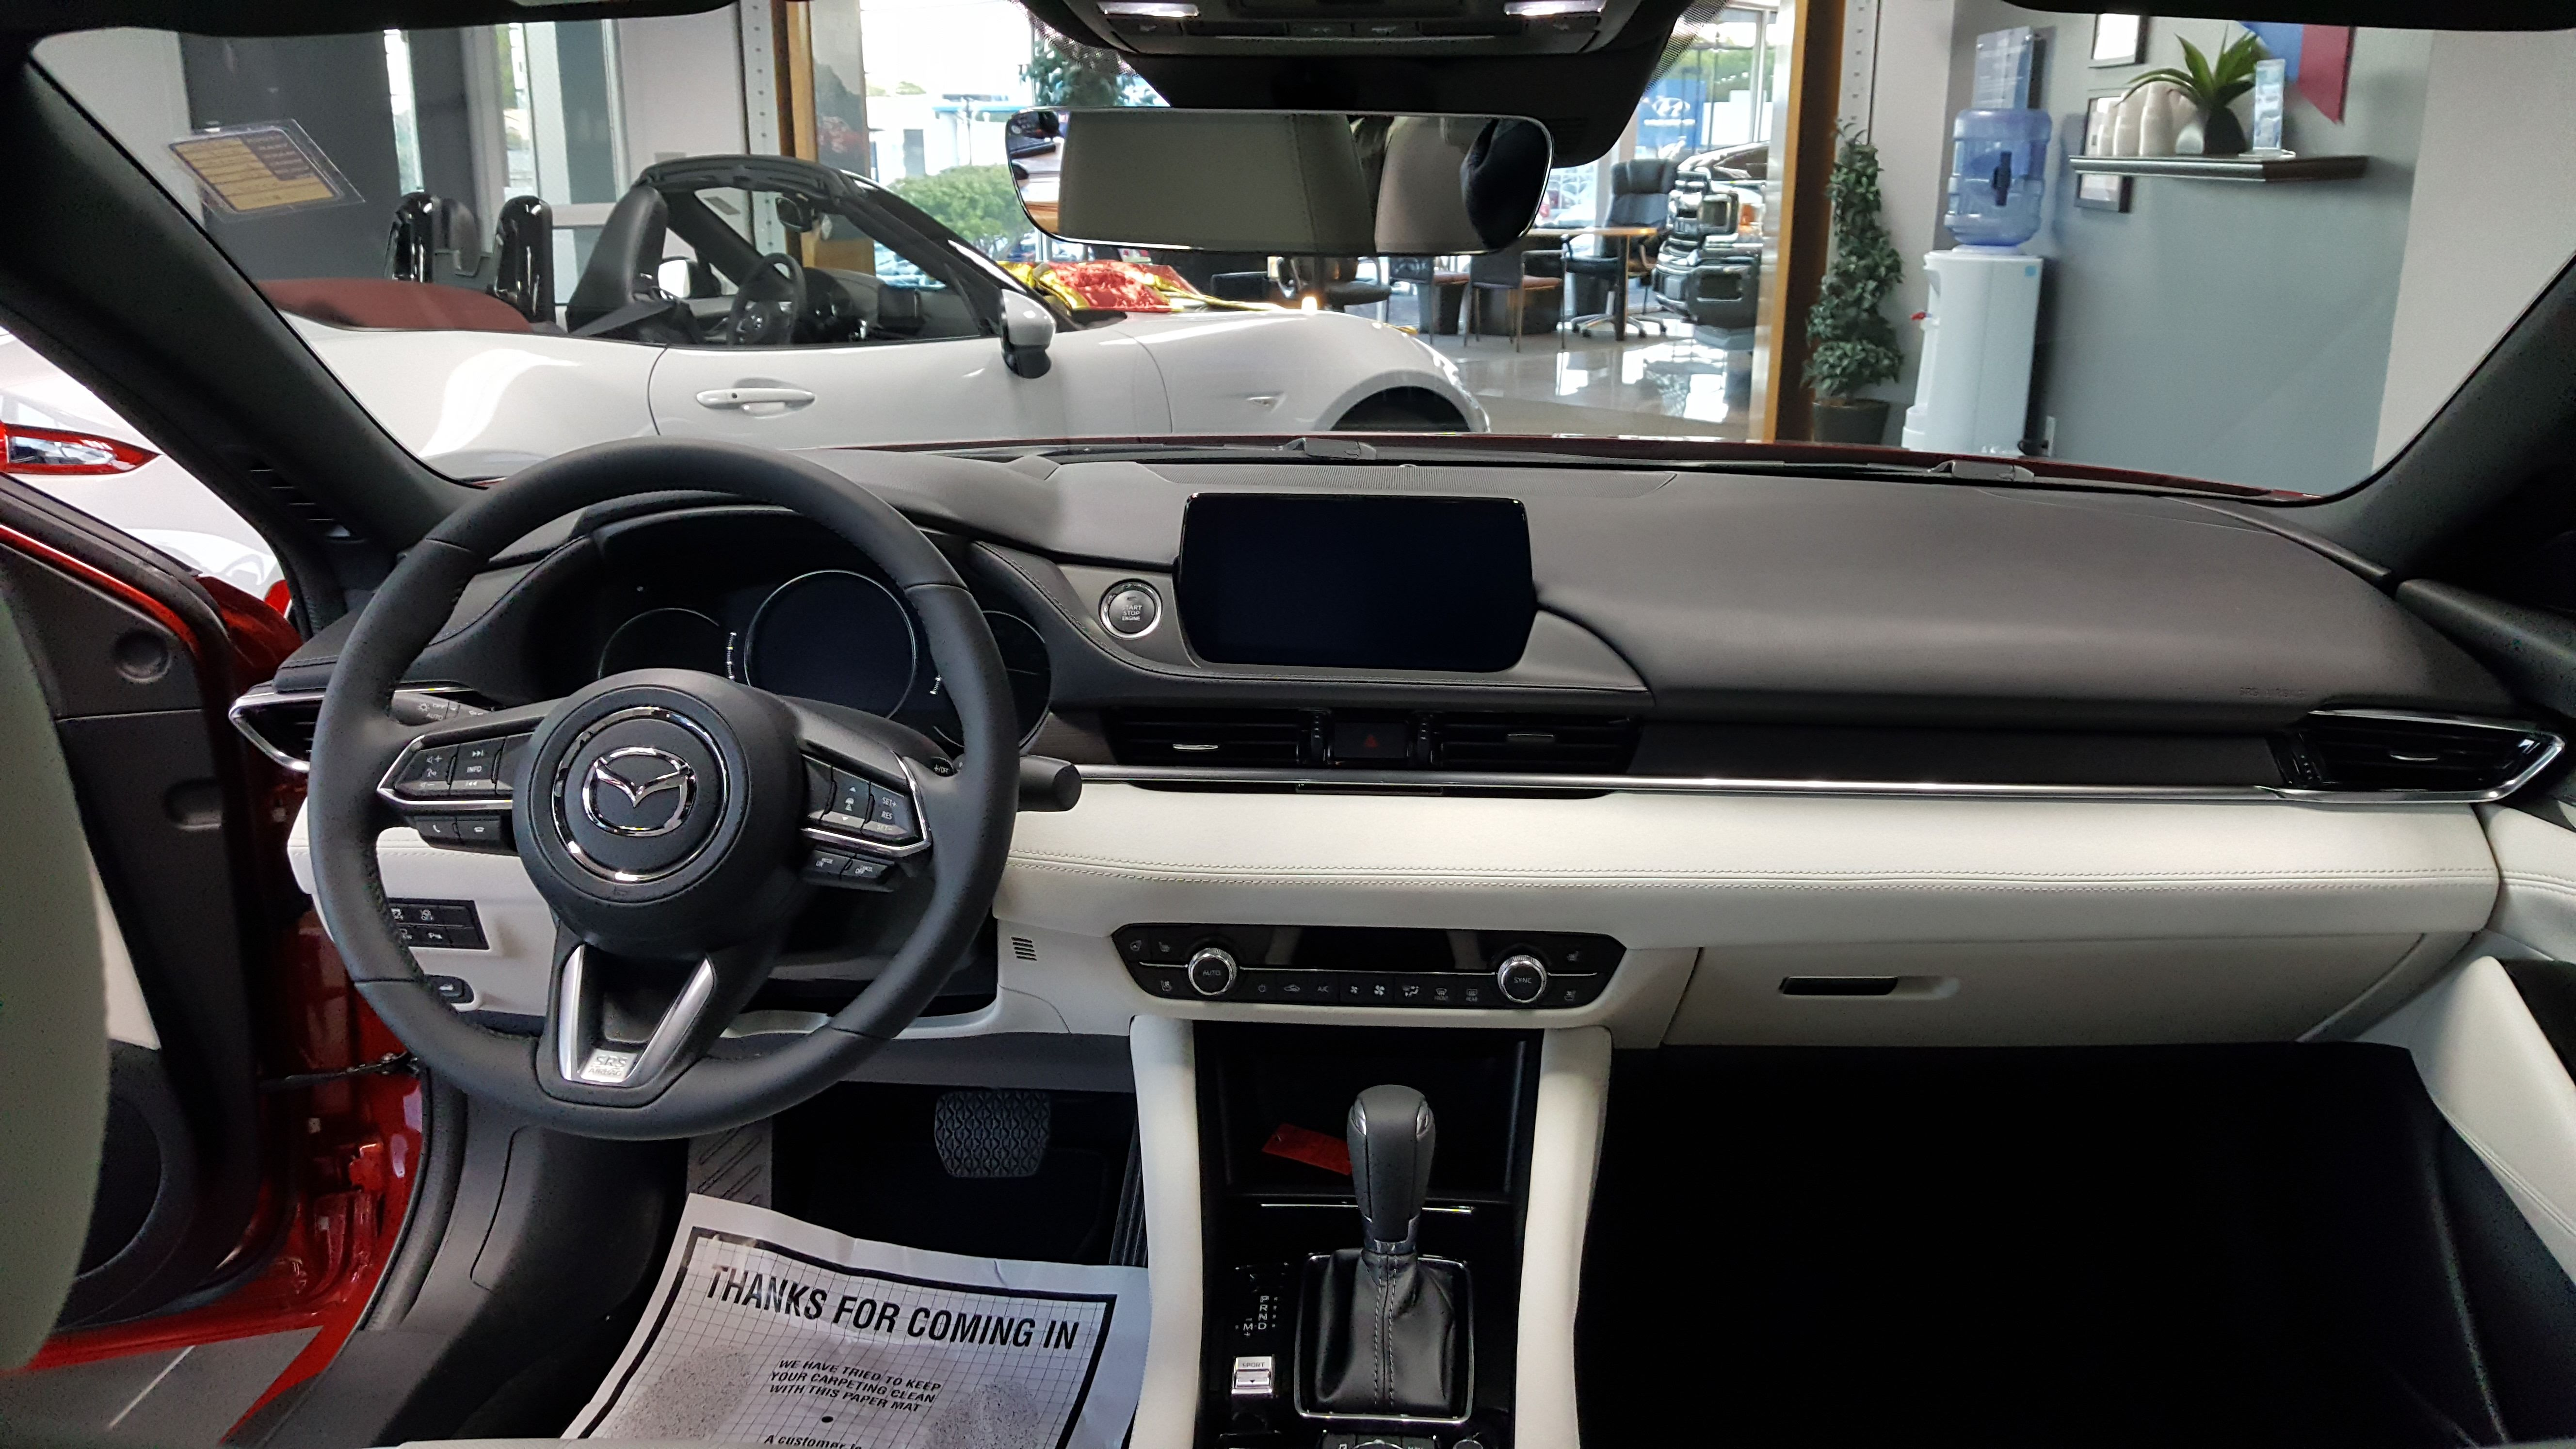 Whaling City Ford >> 2018 Mazda Mazda6 Signature interior | Shutters for sale, Best interior design, Mazda